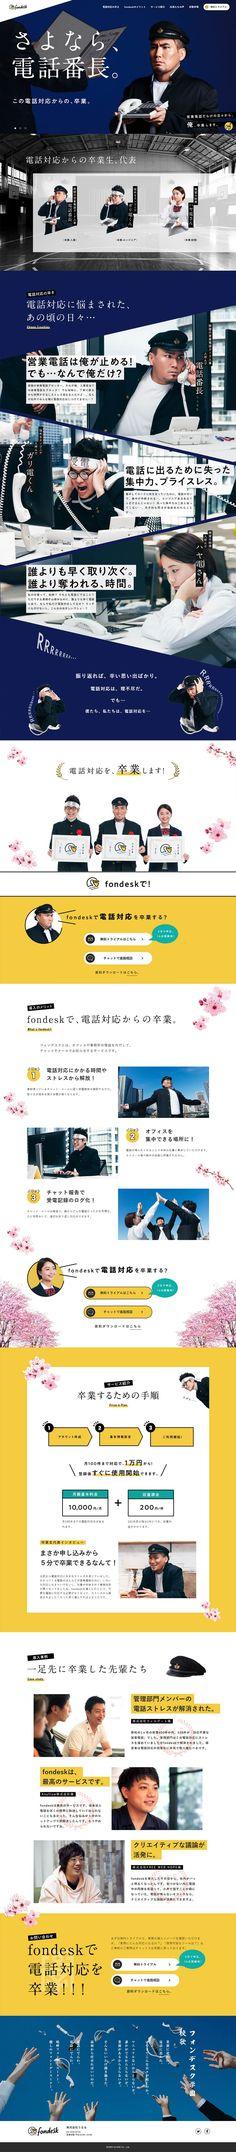 fondesk SANKOU! Web Japan, Pix Art, Site Design, Web Design Inspiration, Website, Website Designs, Yard Design, Design Websites